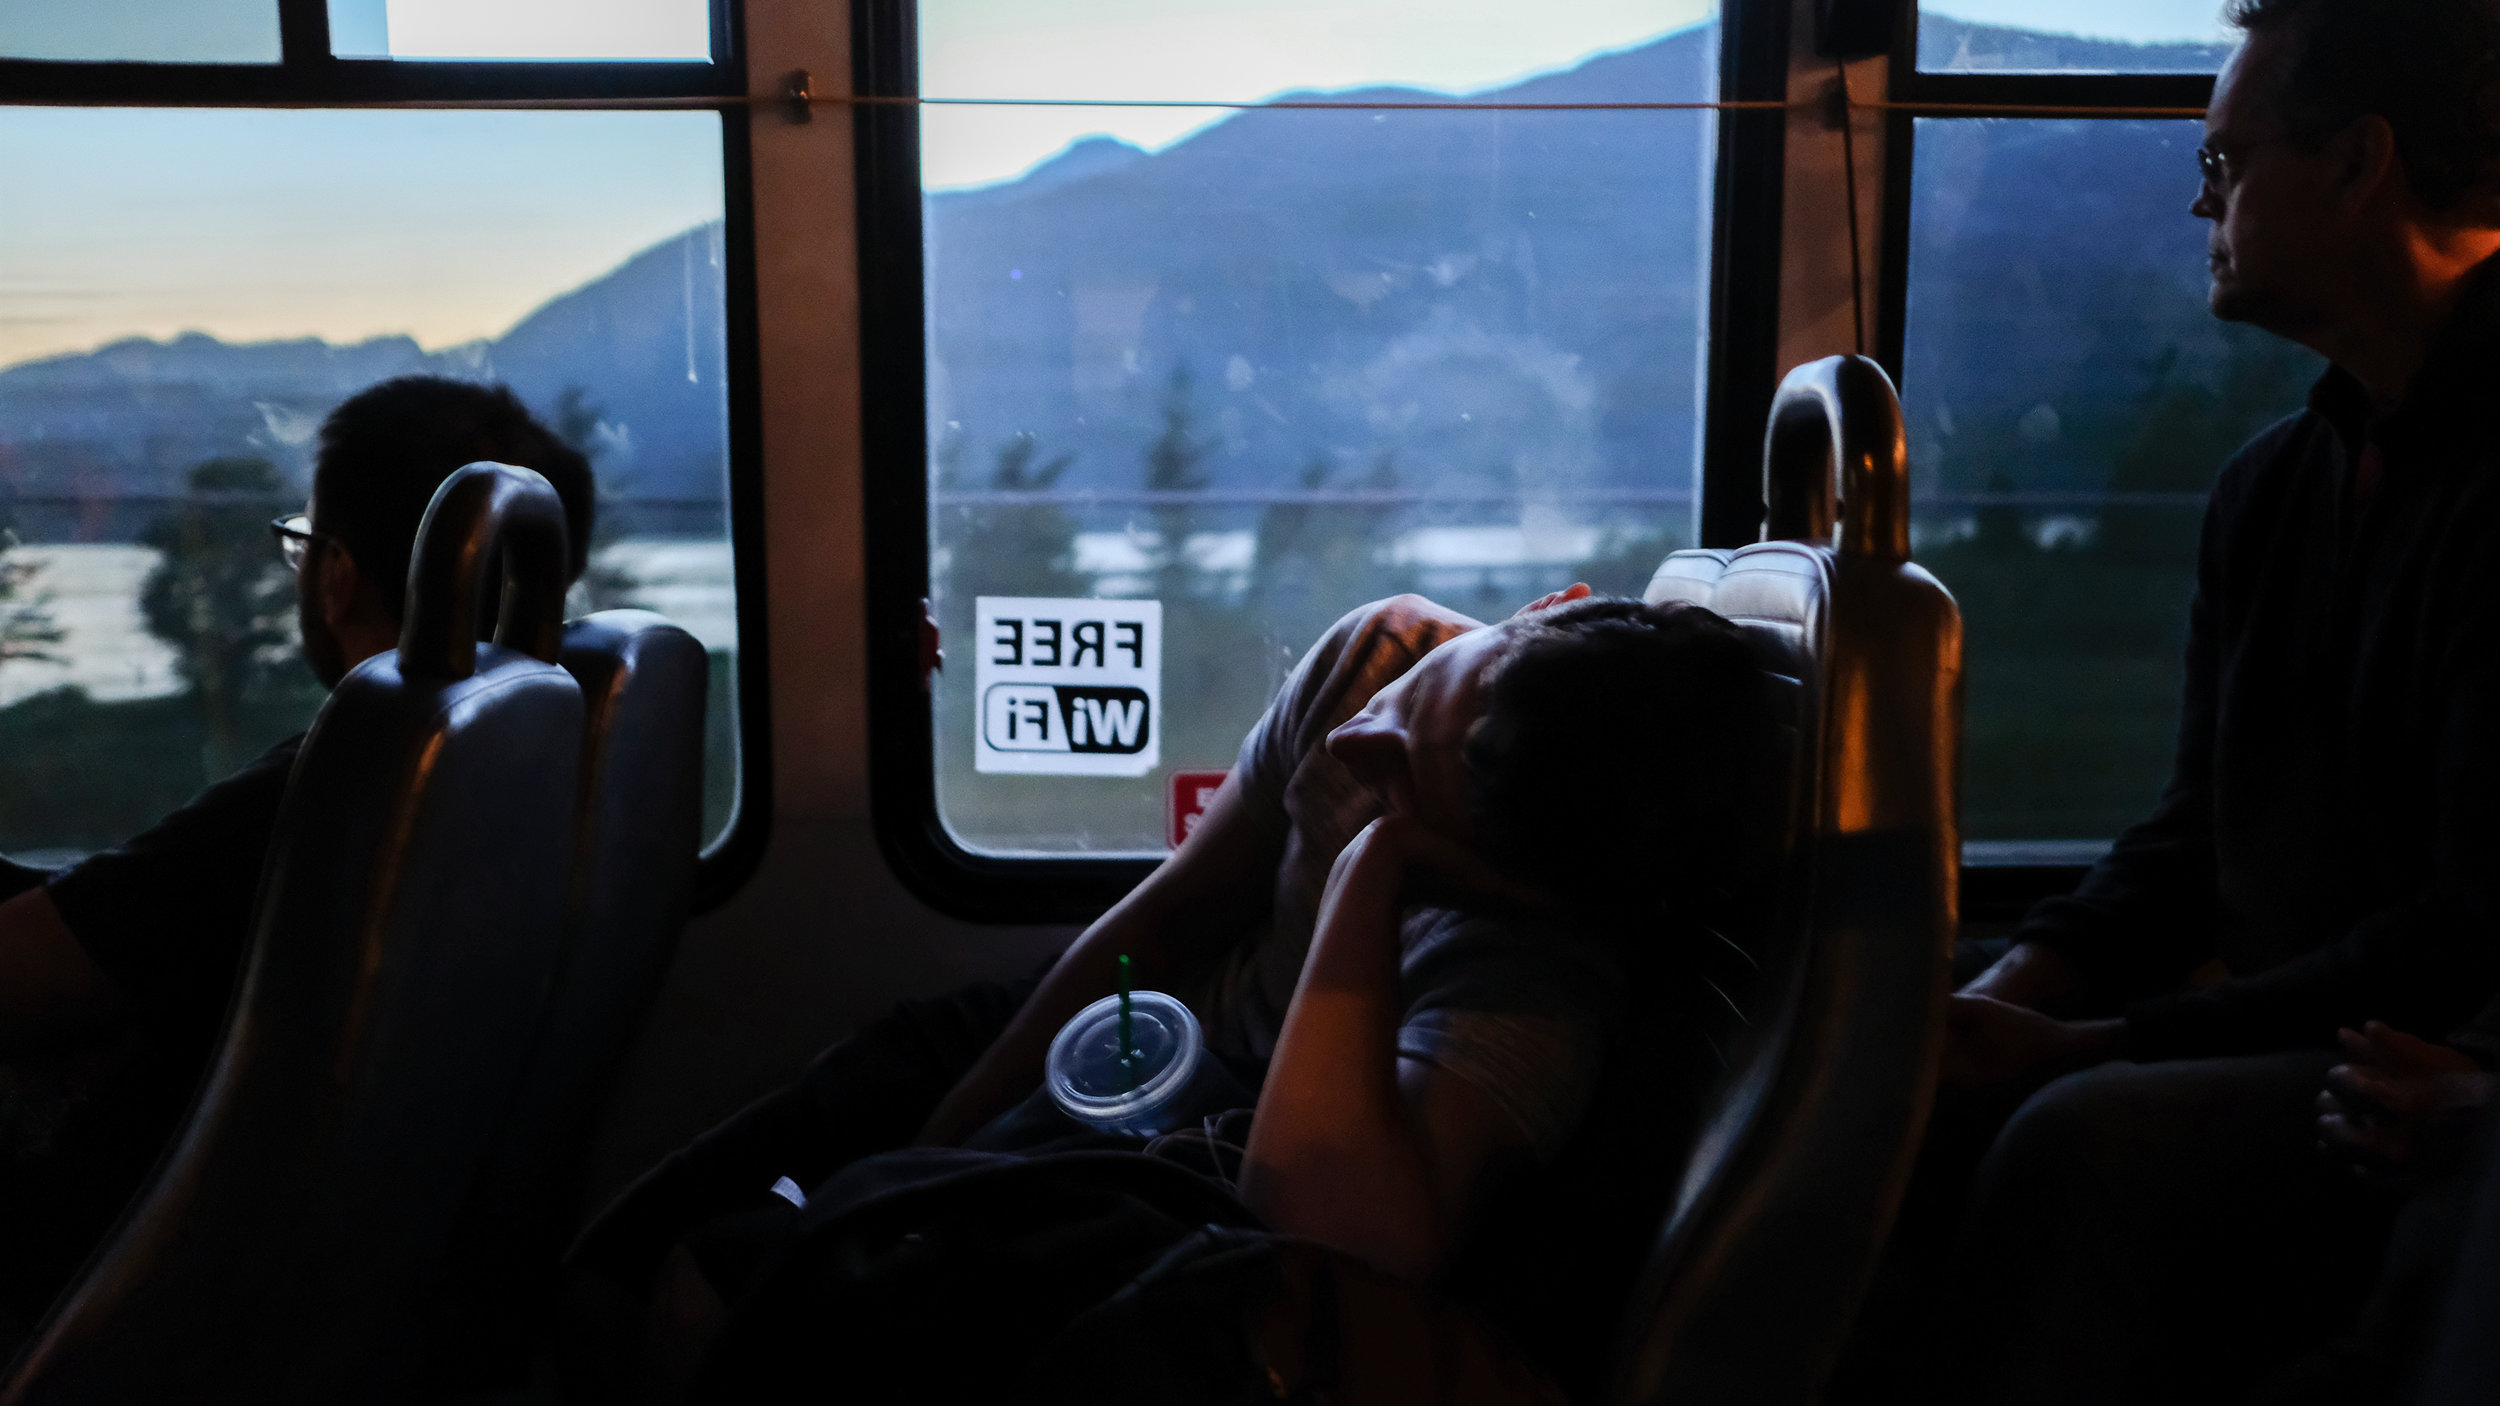 01_VANCOUVER_Whisler-bus.jpg